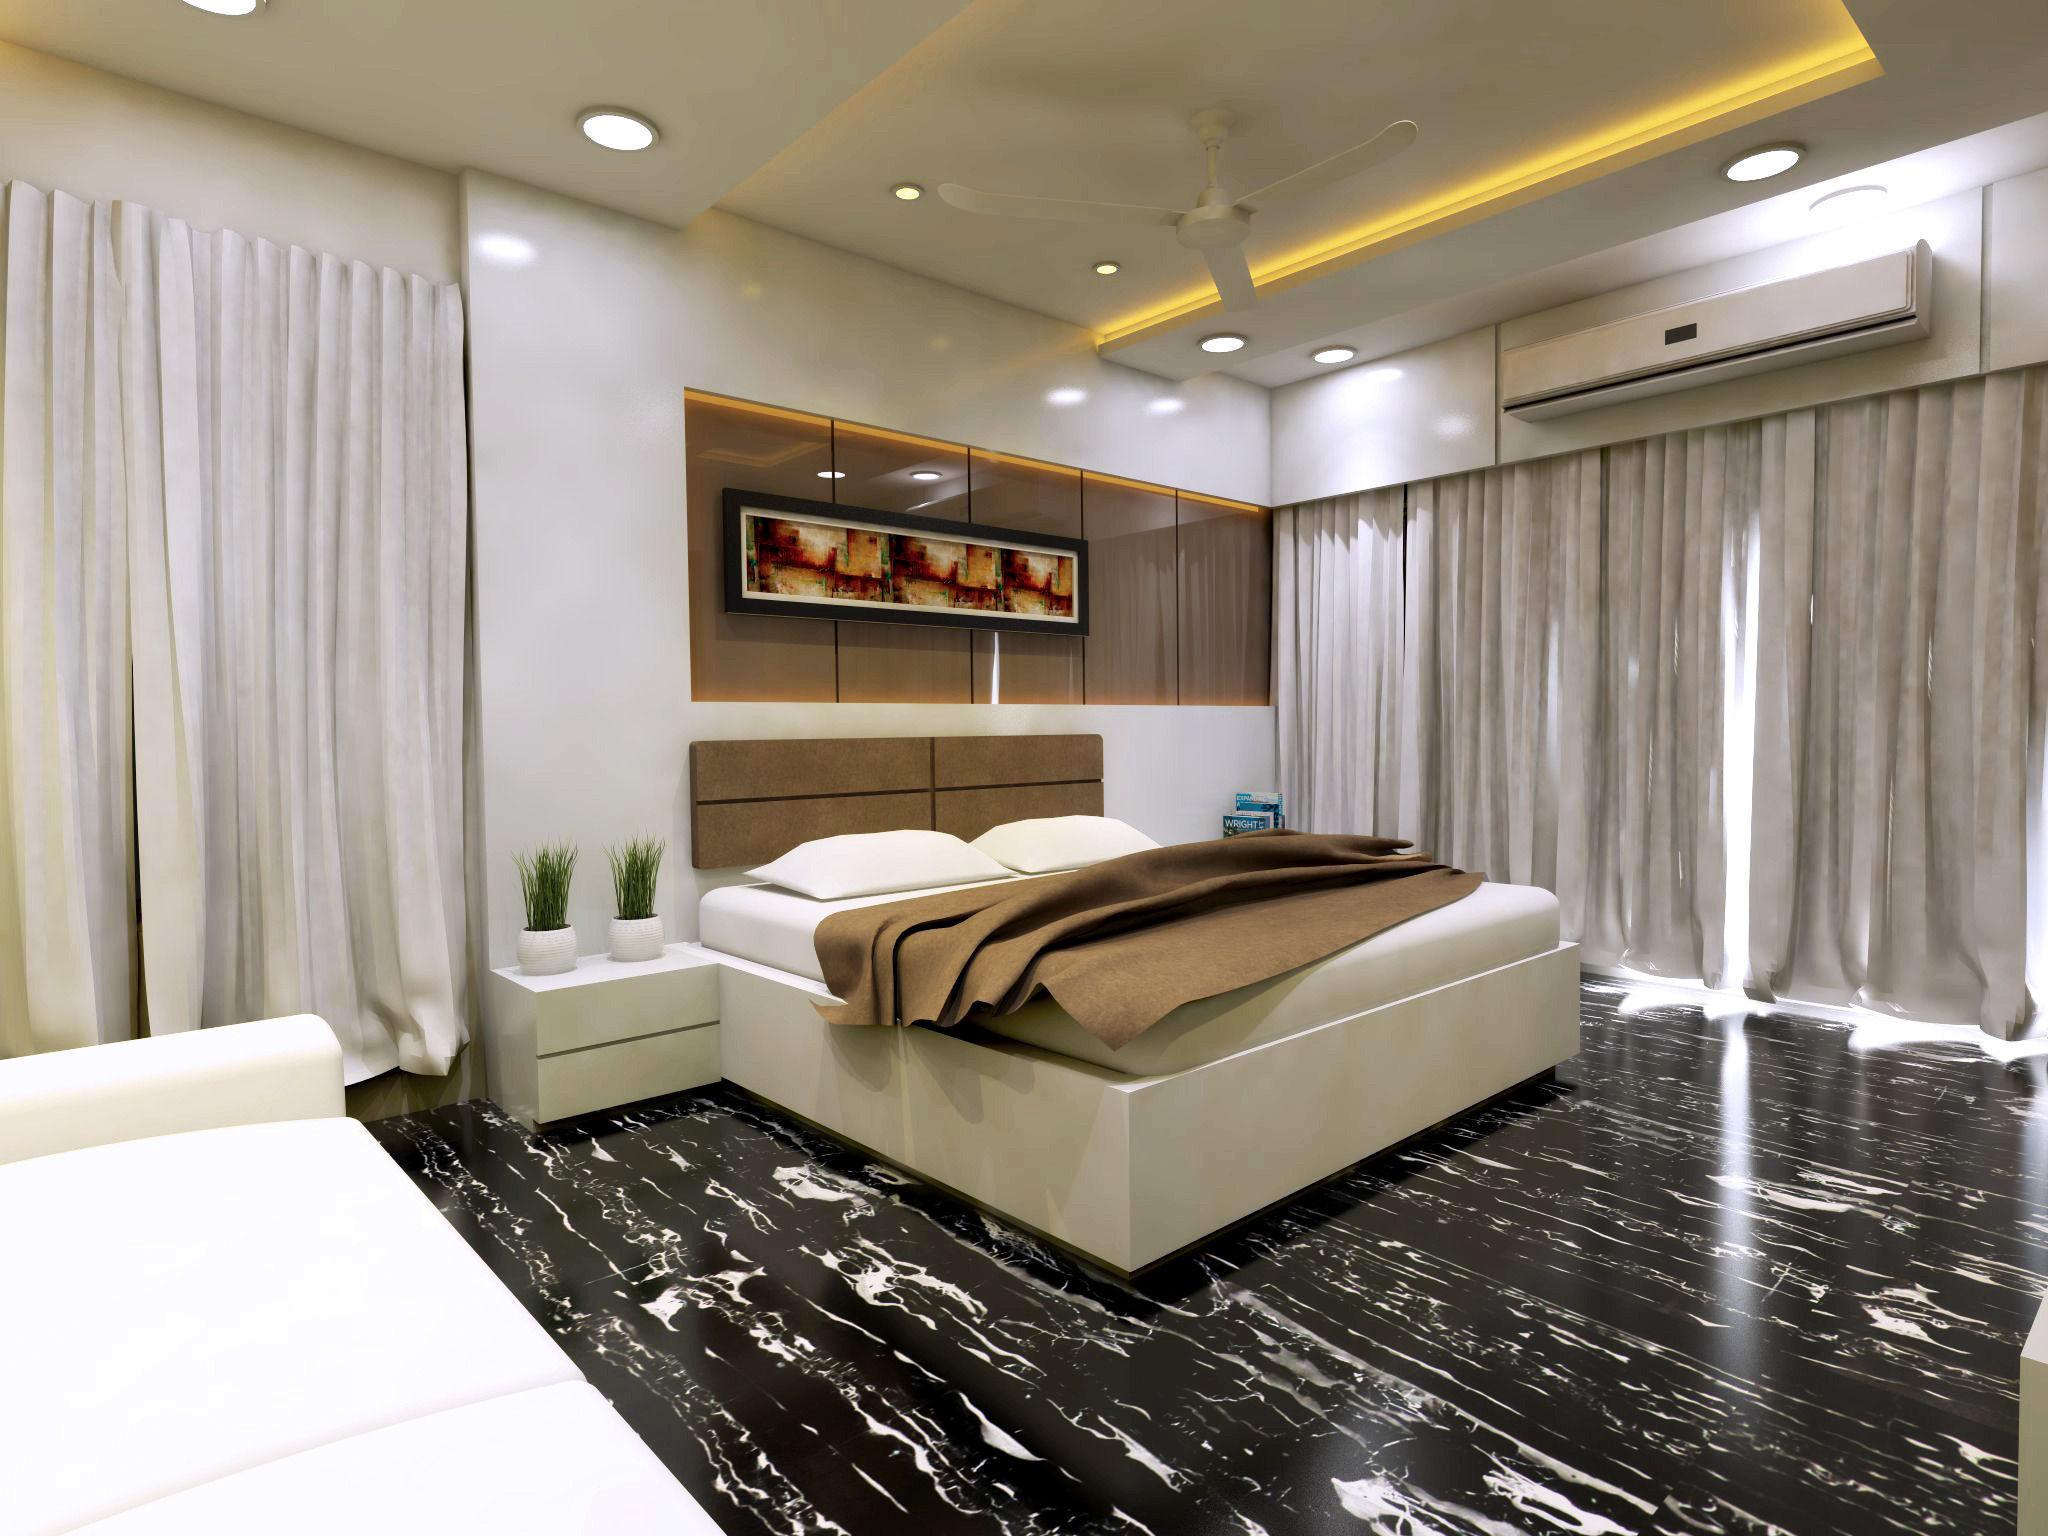 Modern Bedroom Interior Vray Rendered 3D model   CGTrader on New Model Bedroom  id=13480